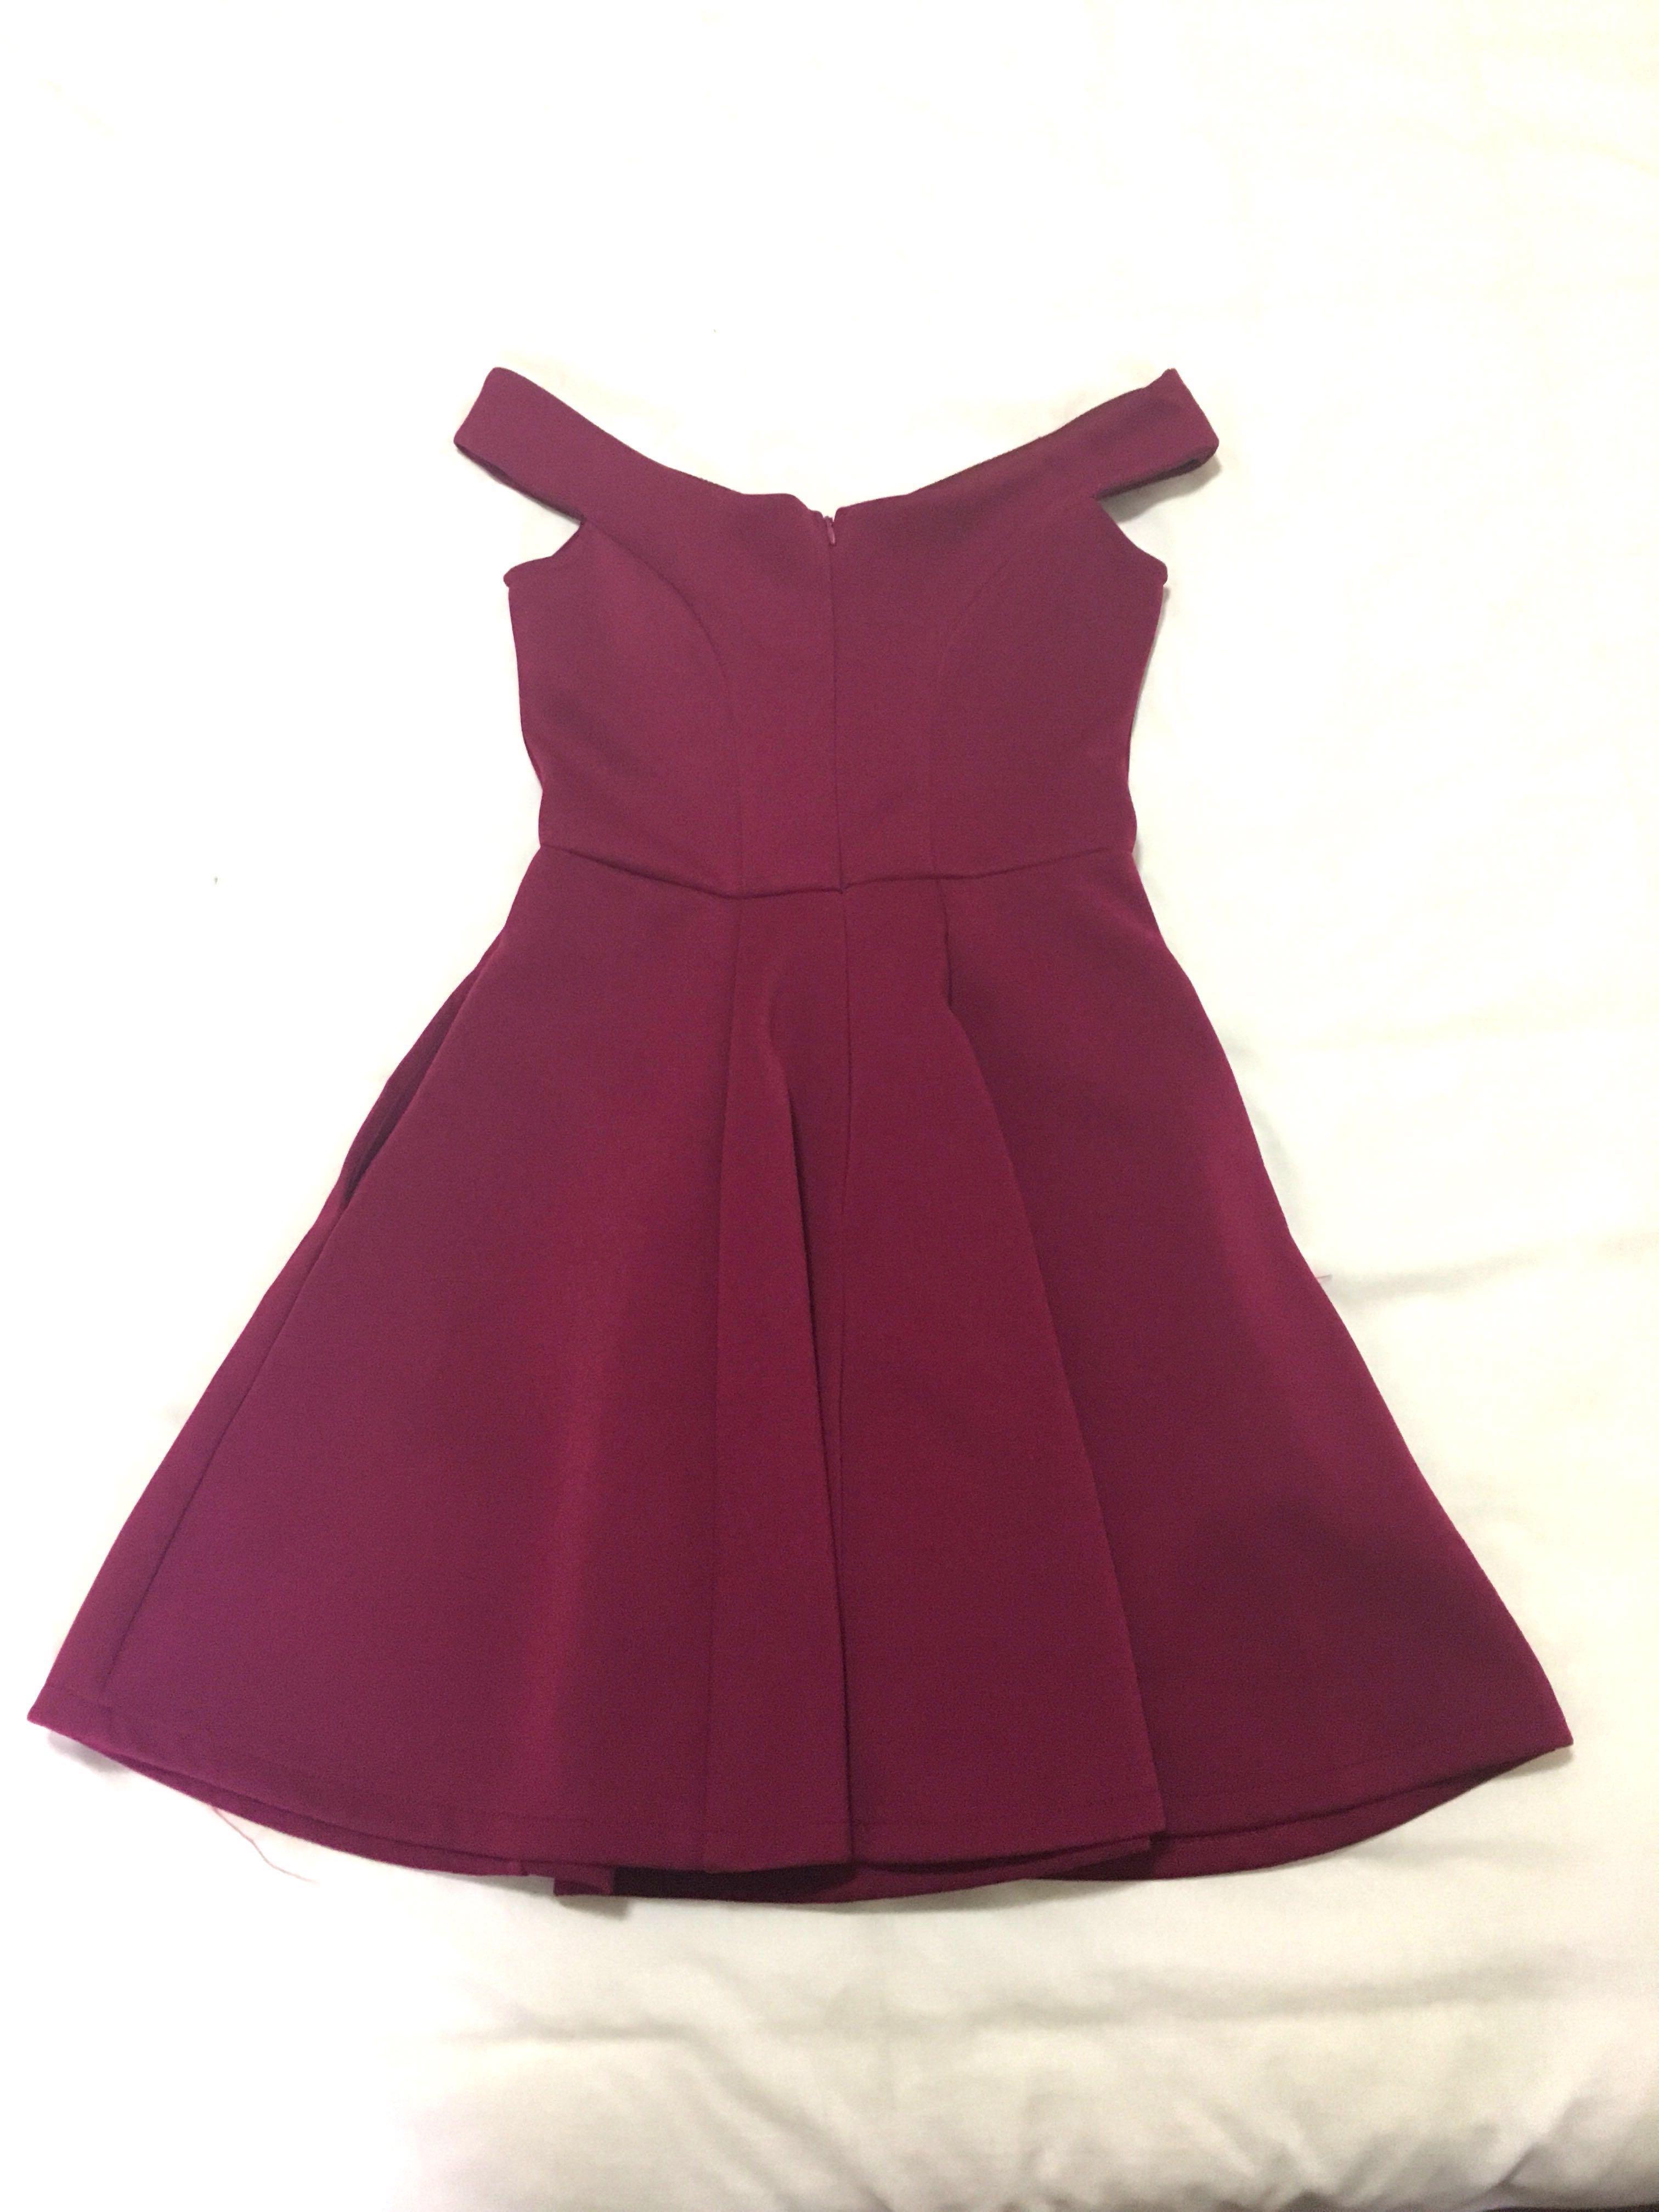 416e2c412828 ELLYSAGE Raspberry Off-Shoulder Dress